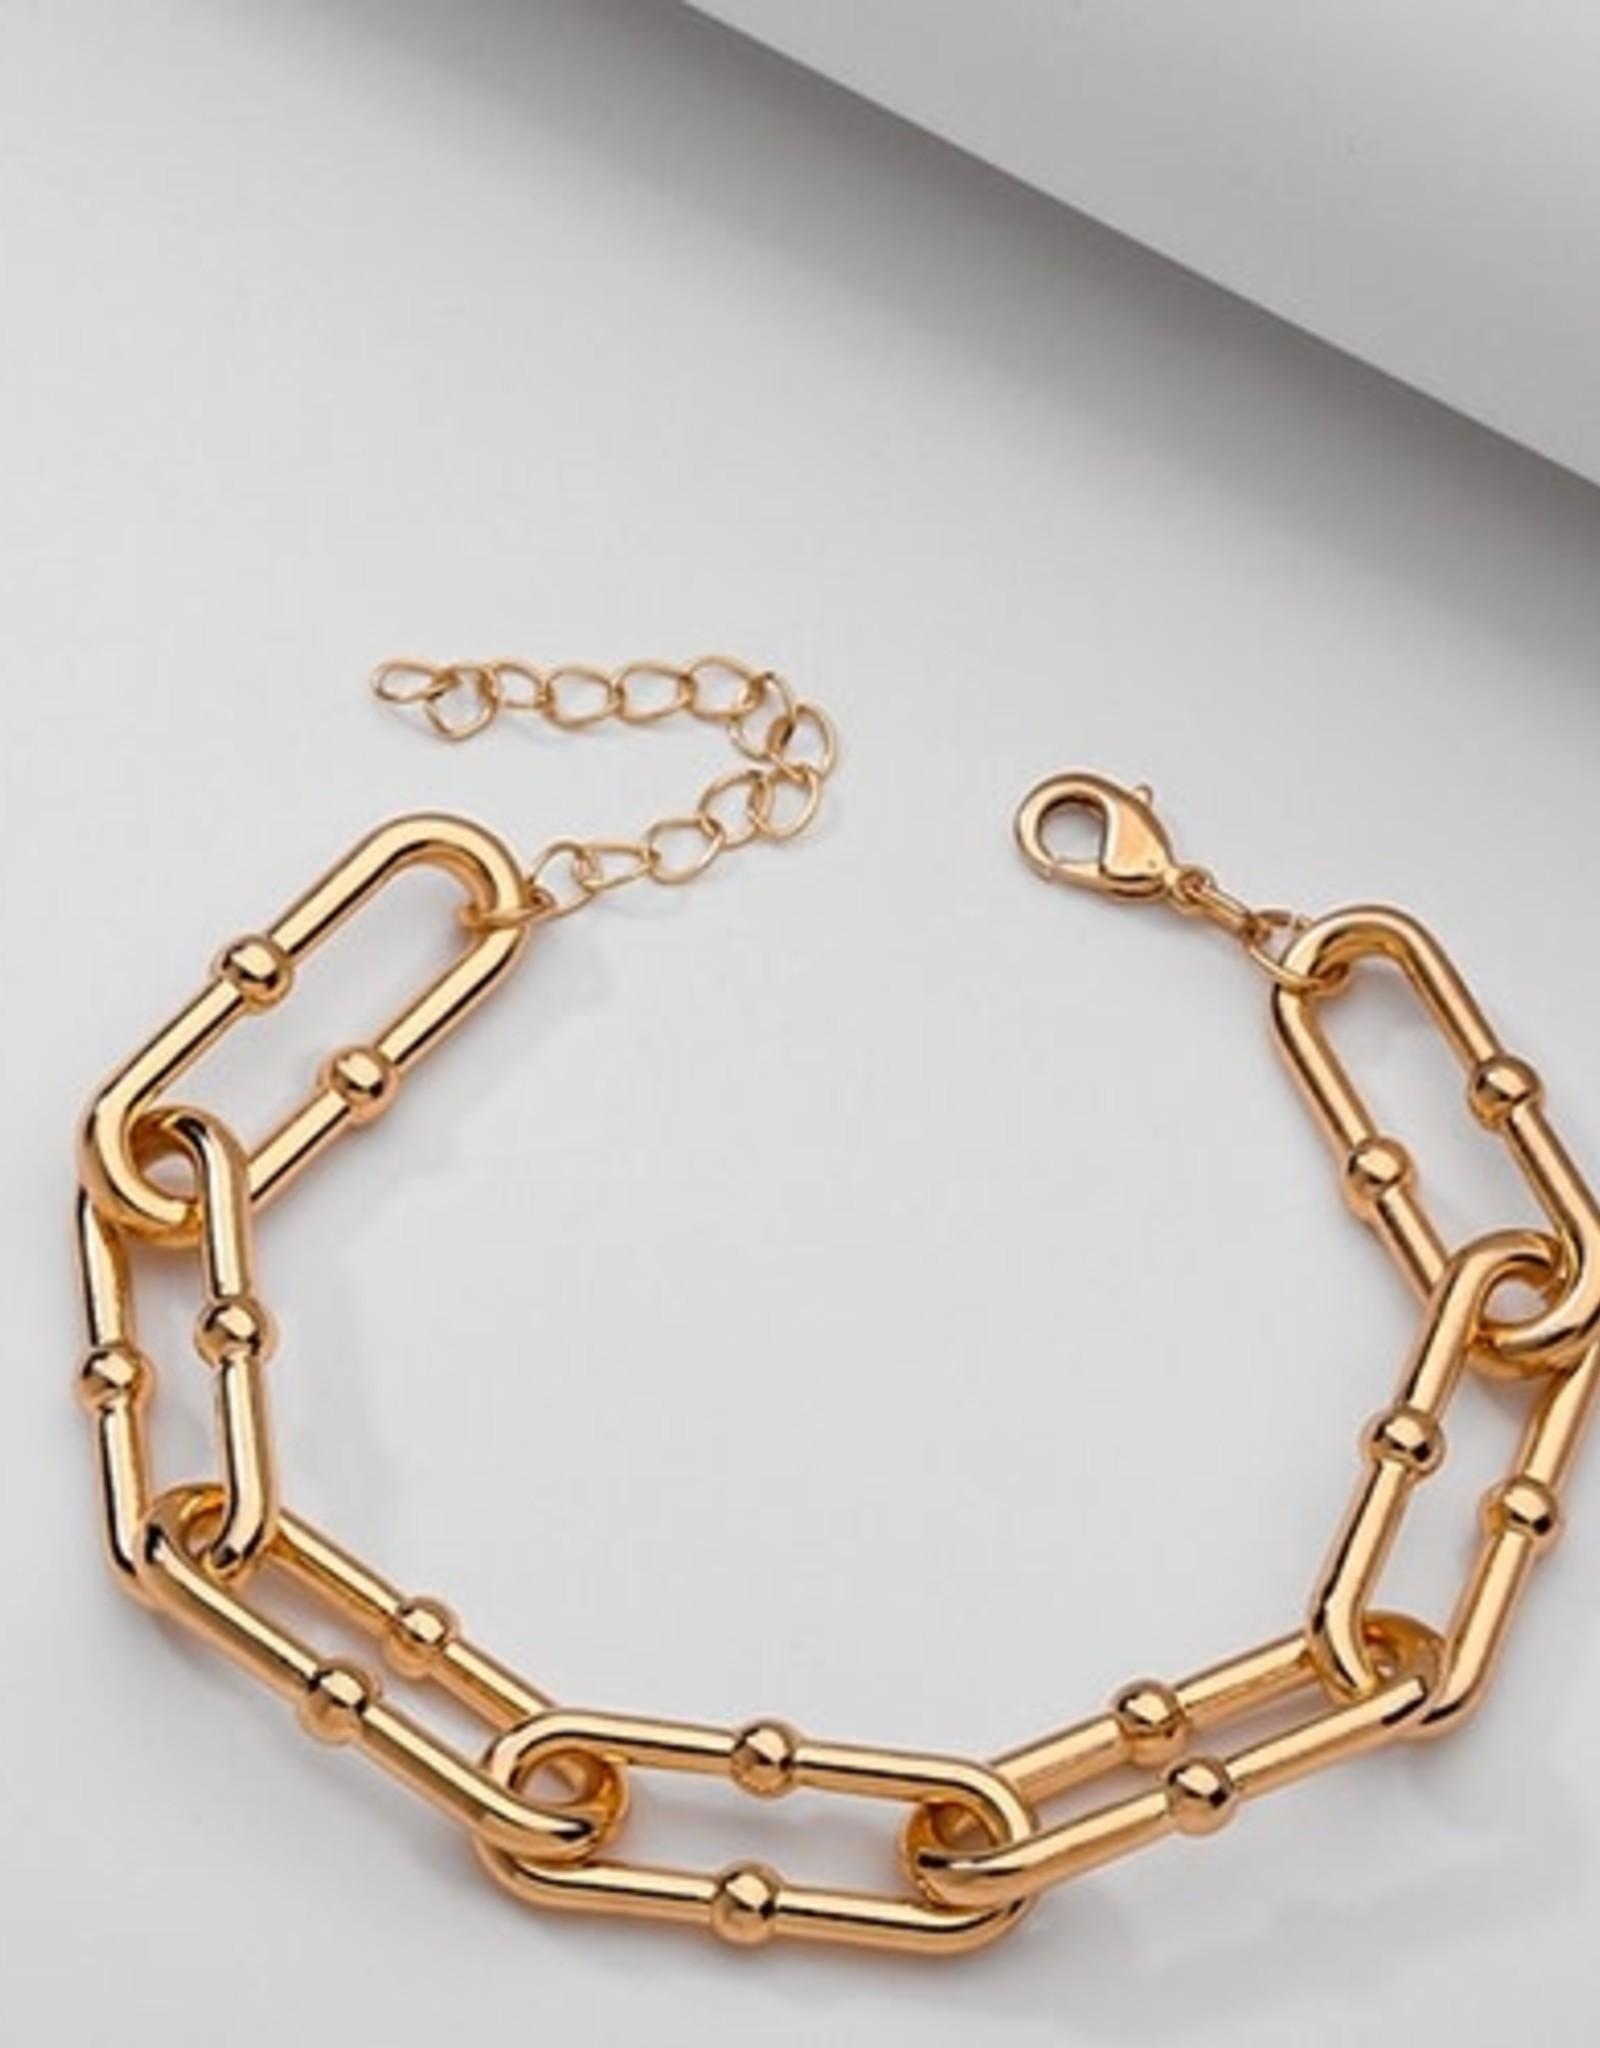 Koko & Lola KoKo & Lola | Nella Gold Chain Link Ball Bracelet